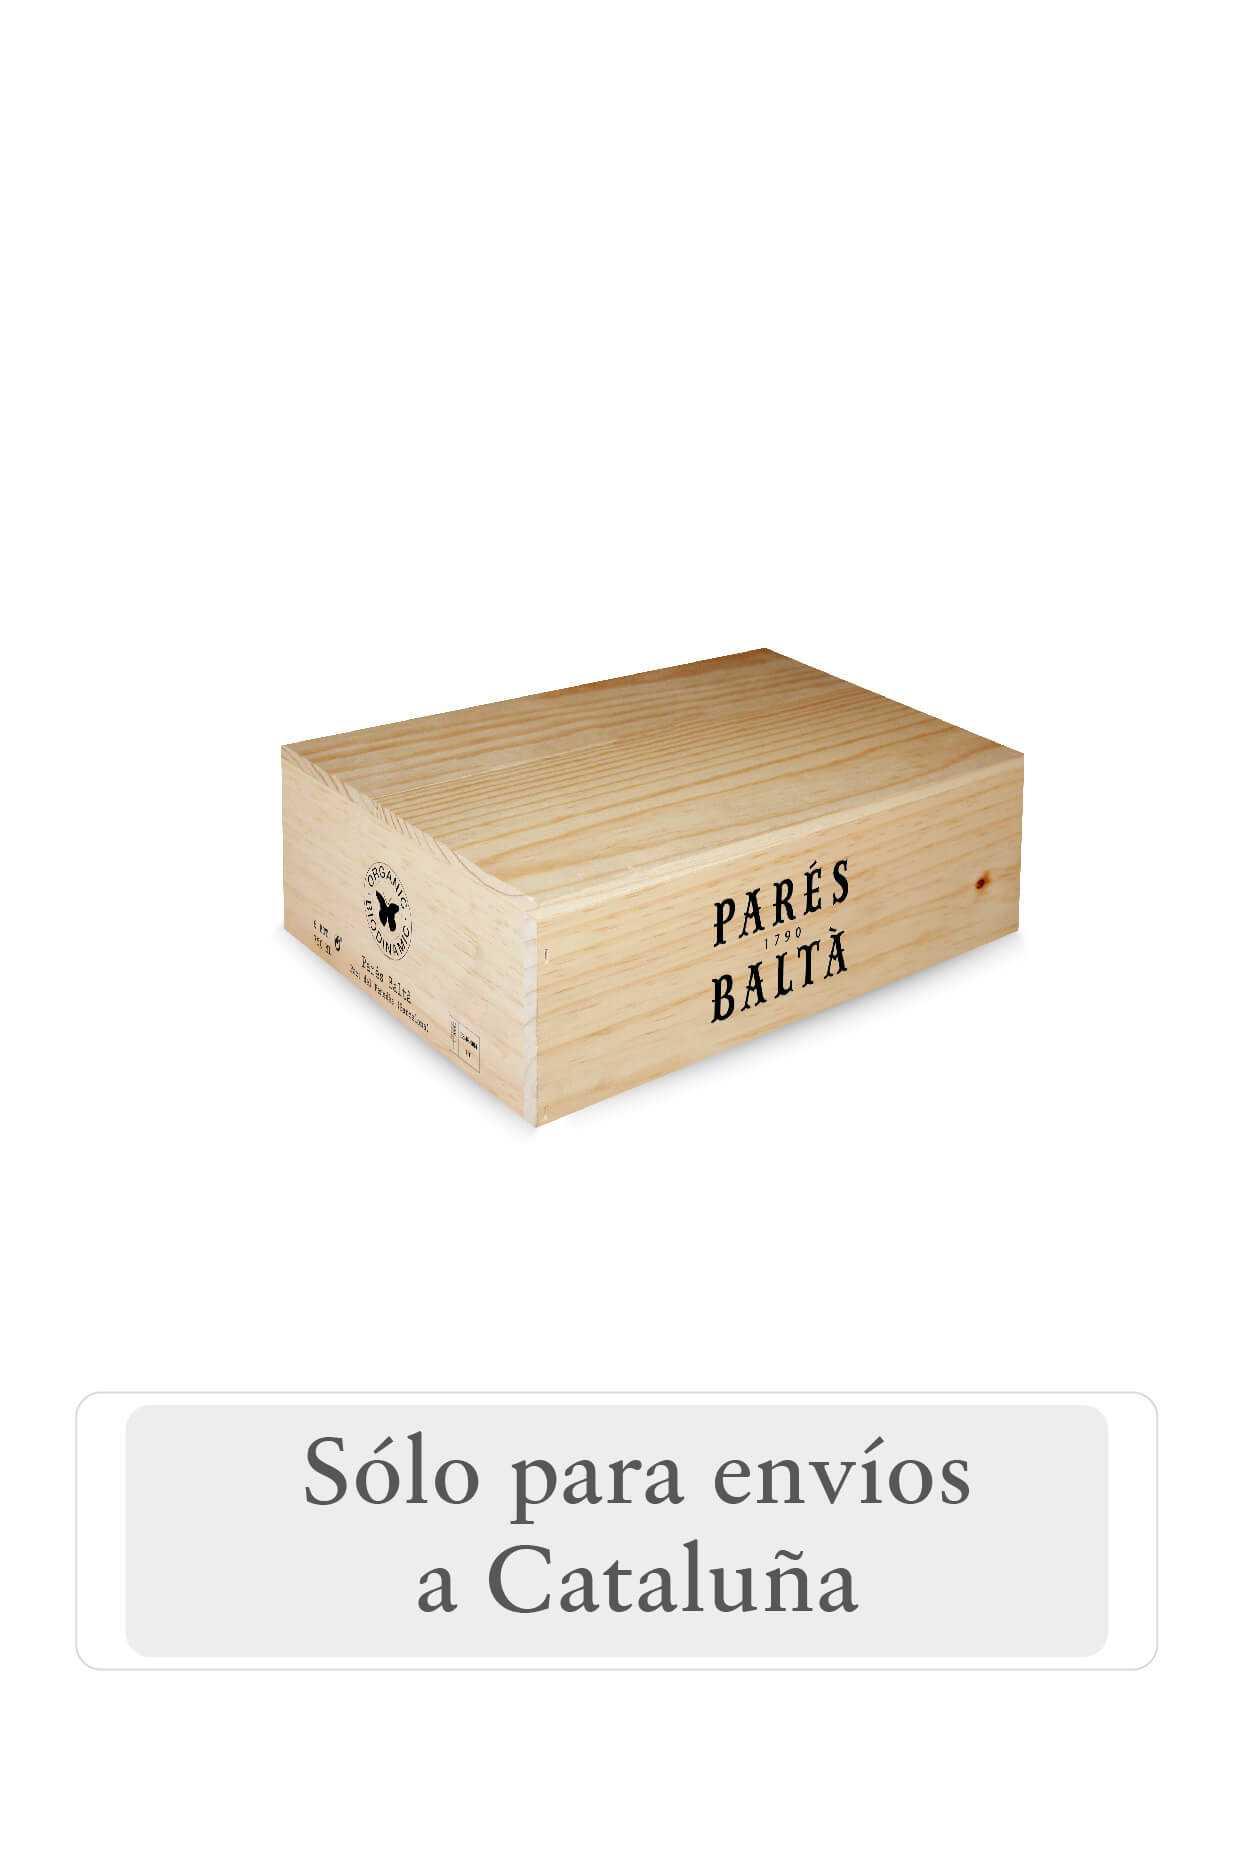 Caja de Madera – 3 botellas